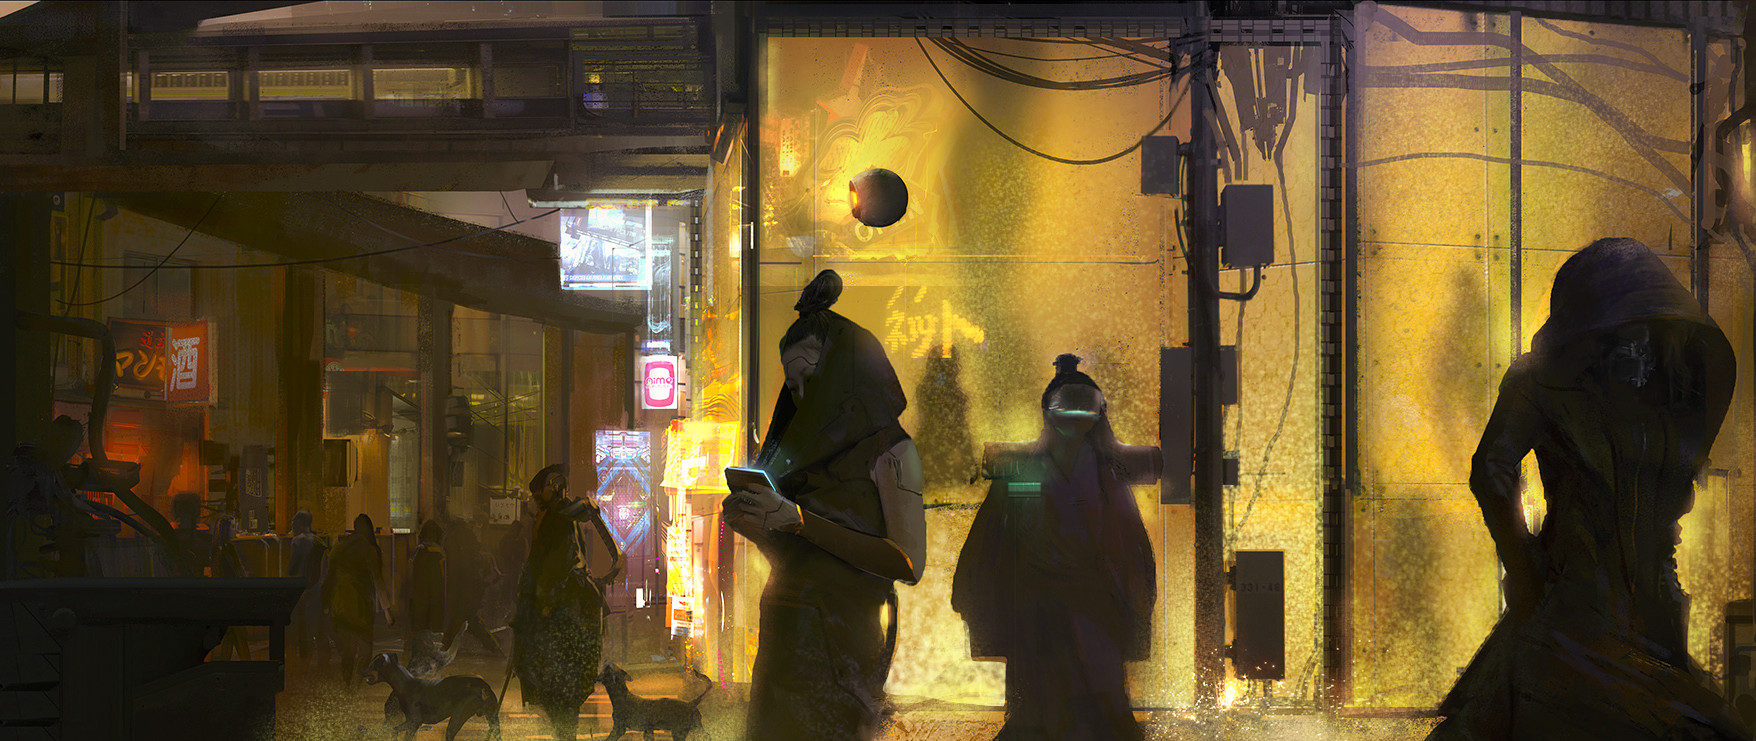 Liang mark cyberpunk